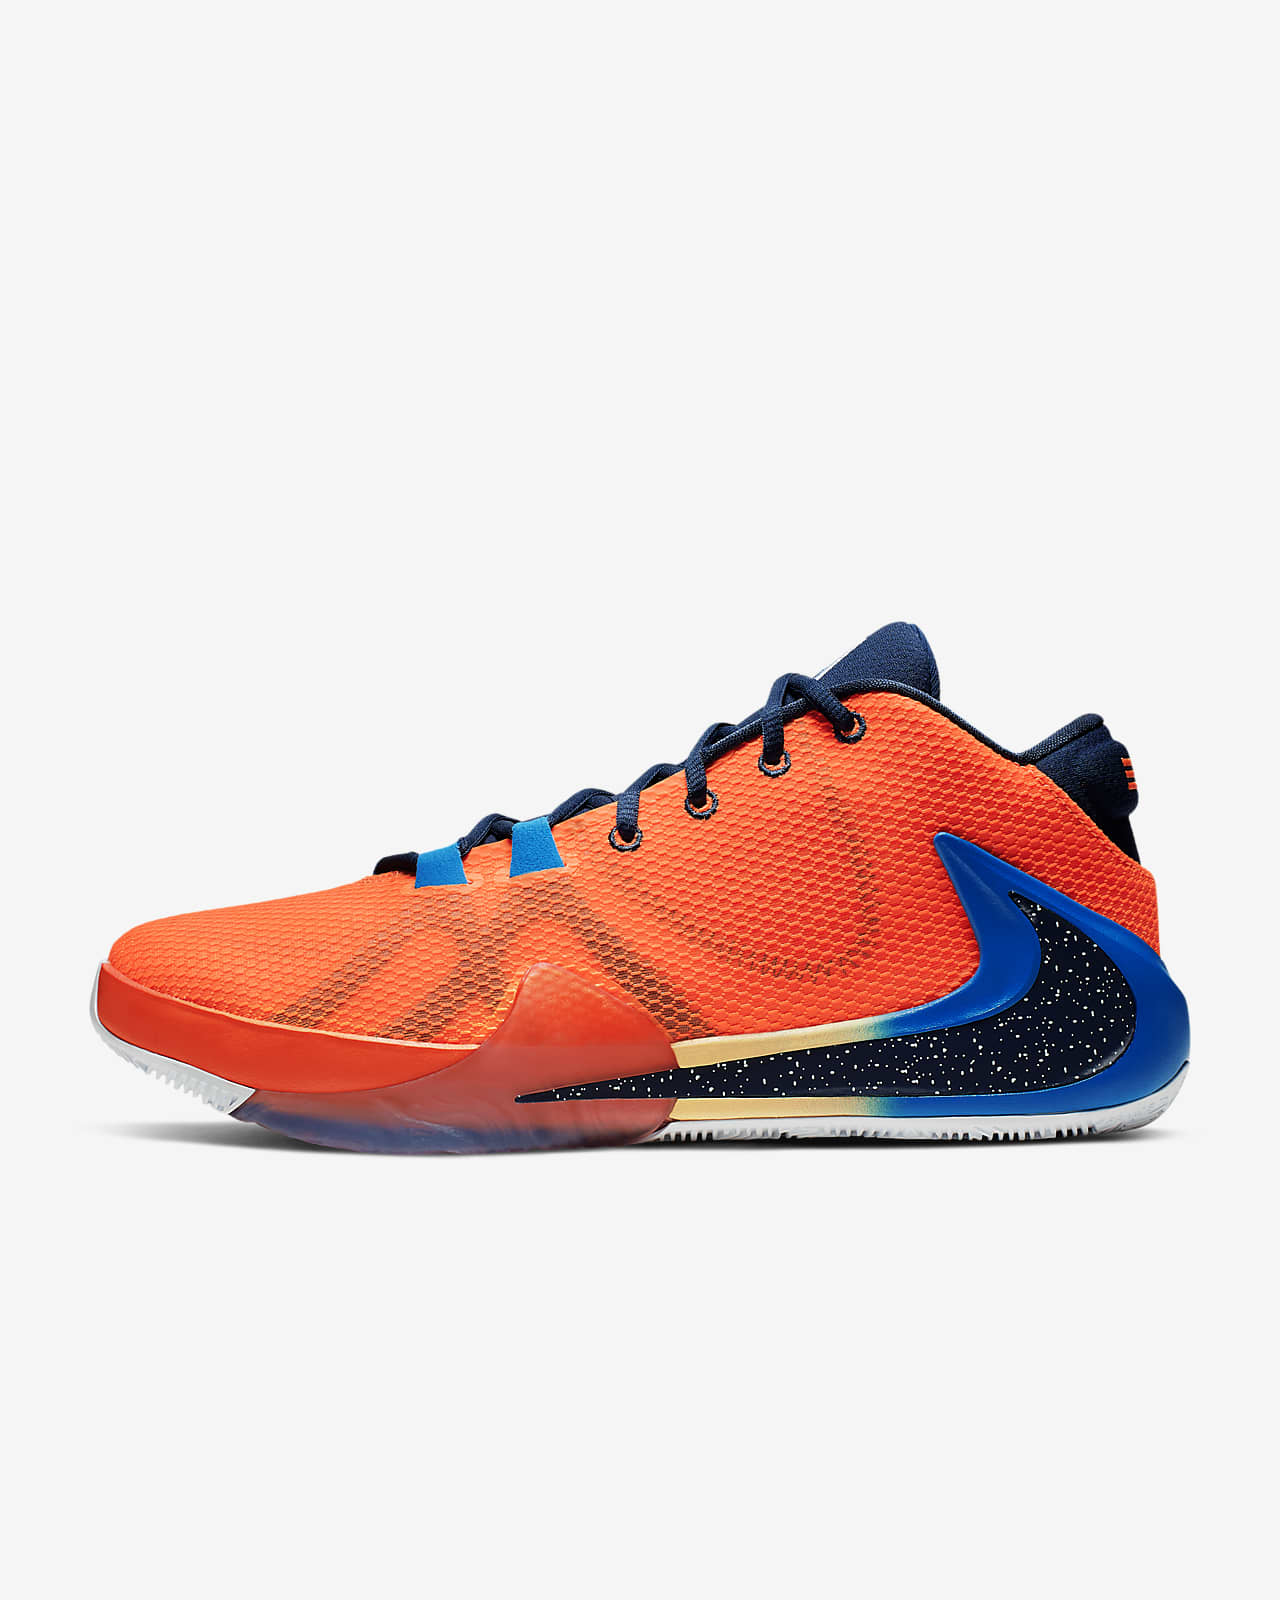 Zoom Freak 1 EP 男子篮球鞋